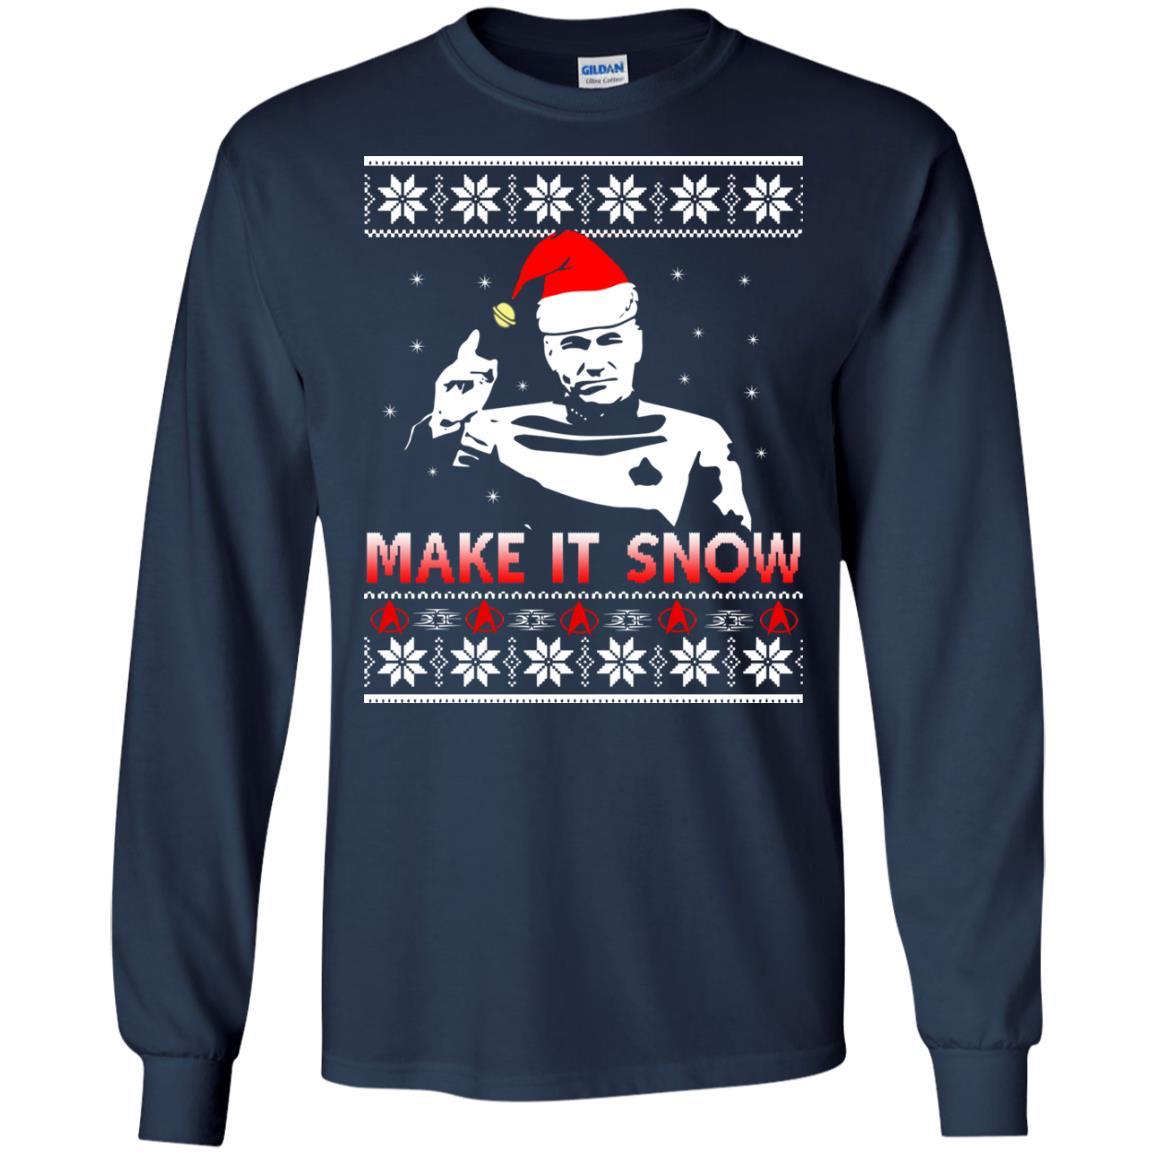 image 2408 - Star Trek make it snow Christmas Sweater, Shirt